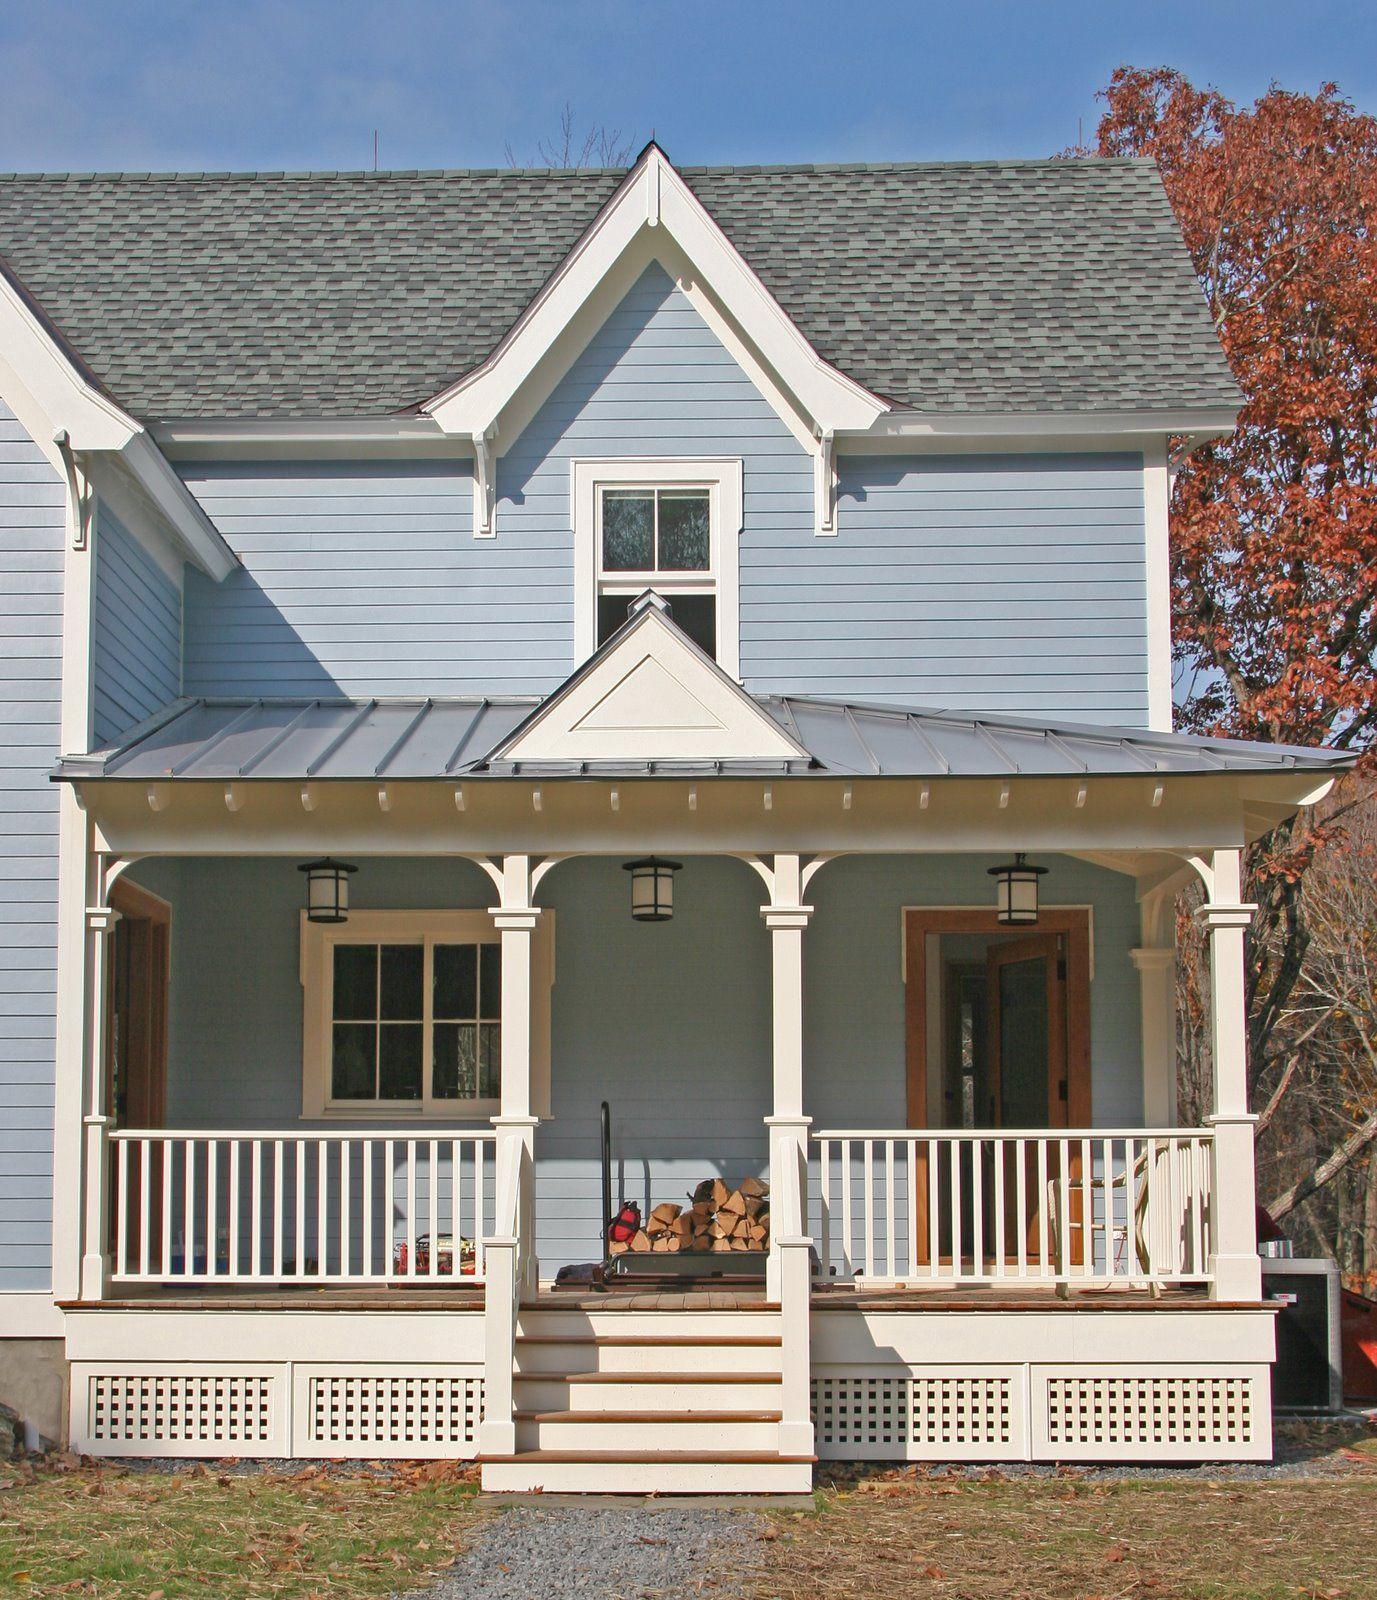 farmhouse porch Porches and Patios House with porch